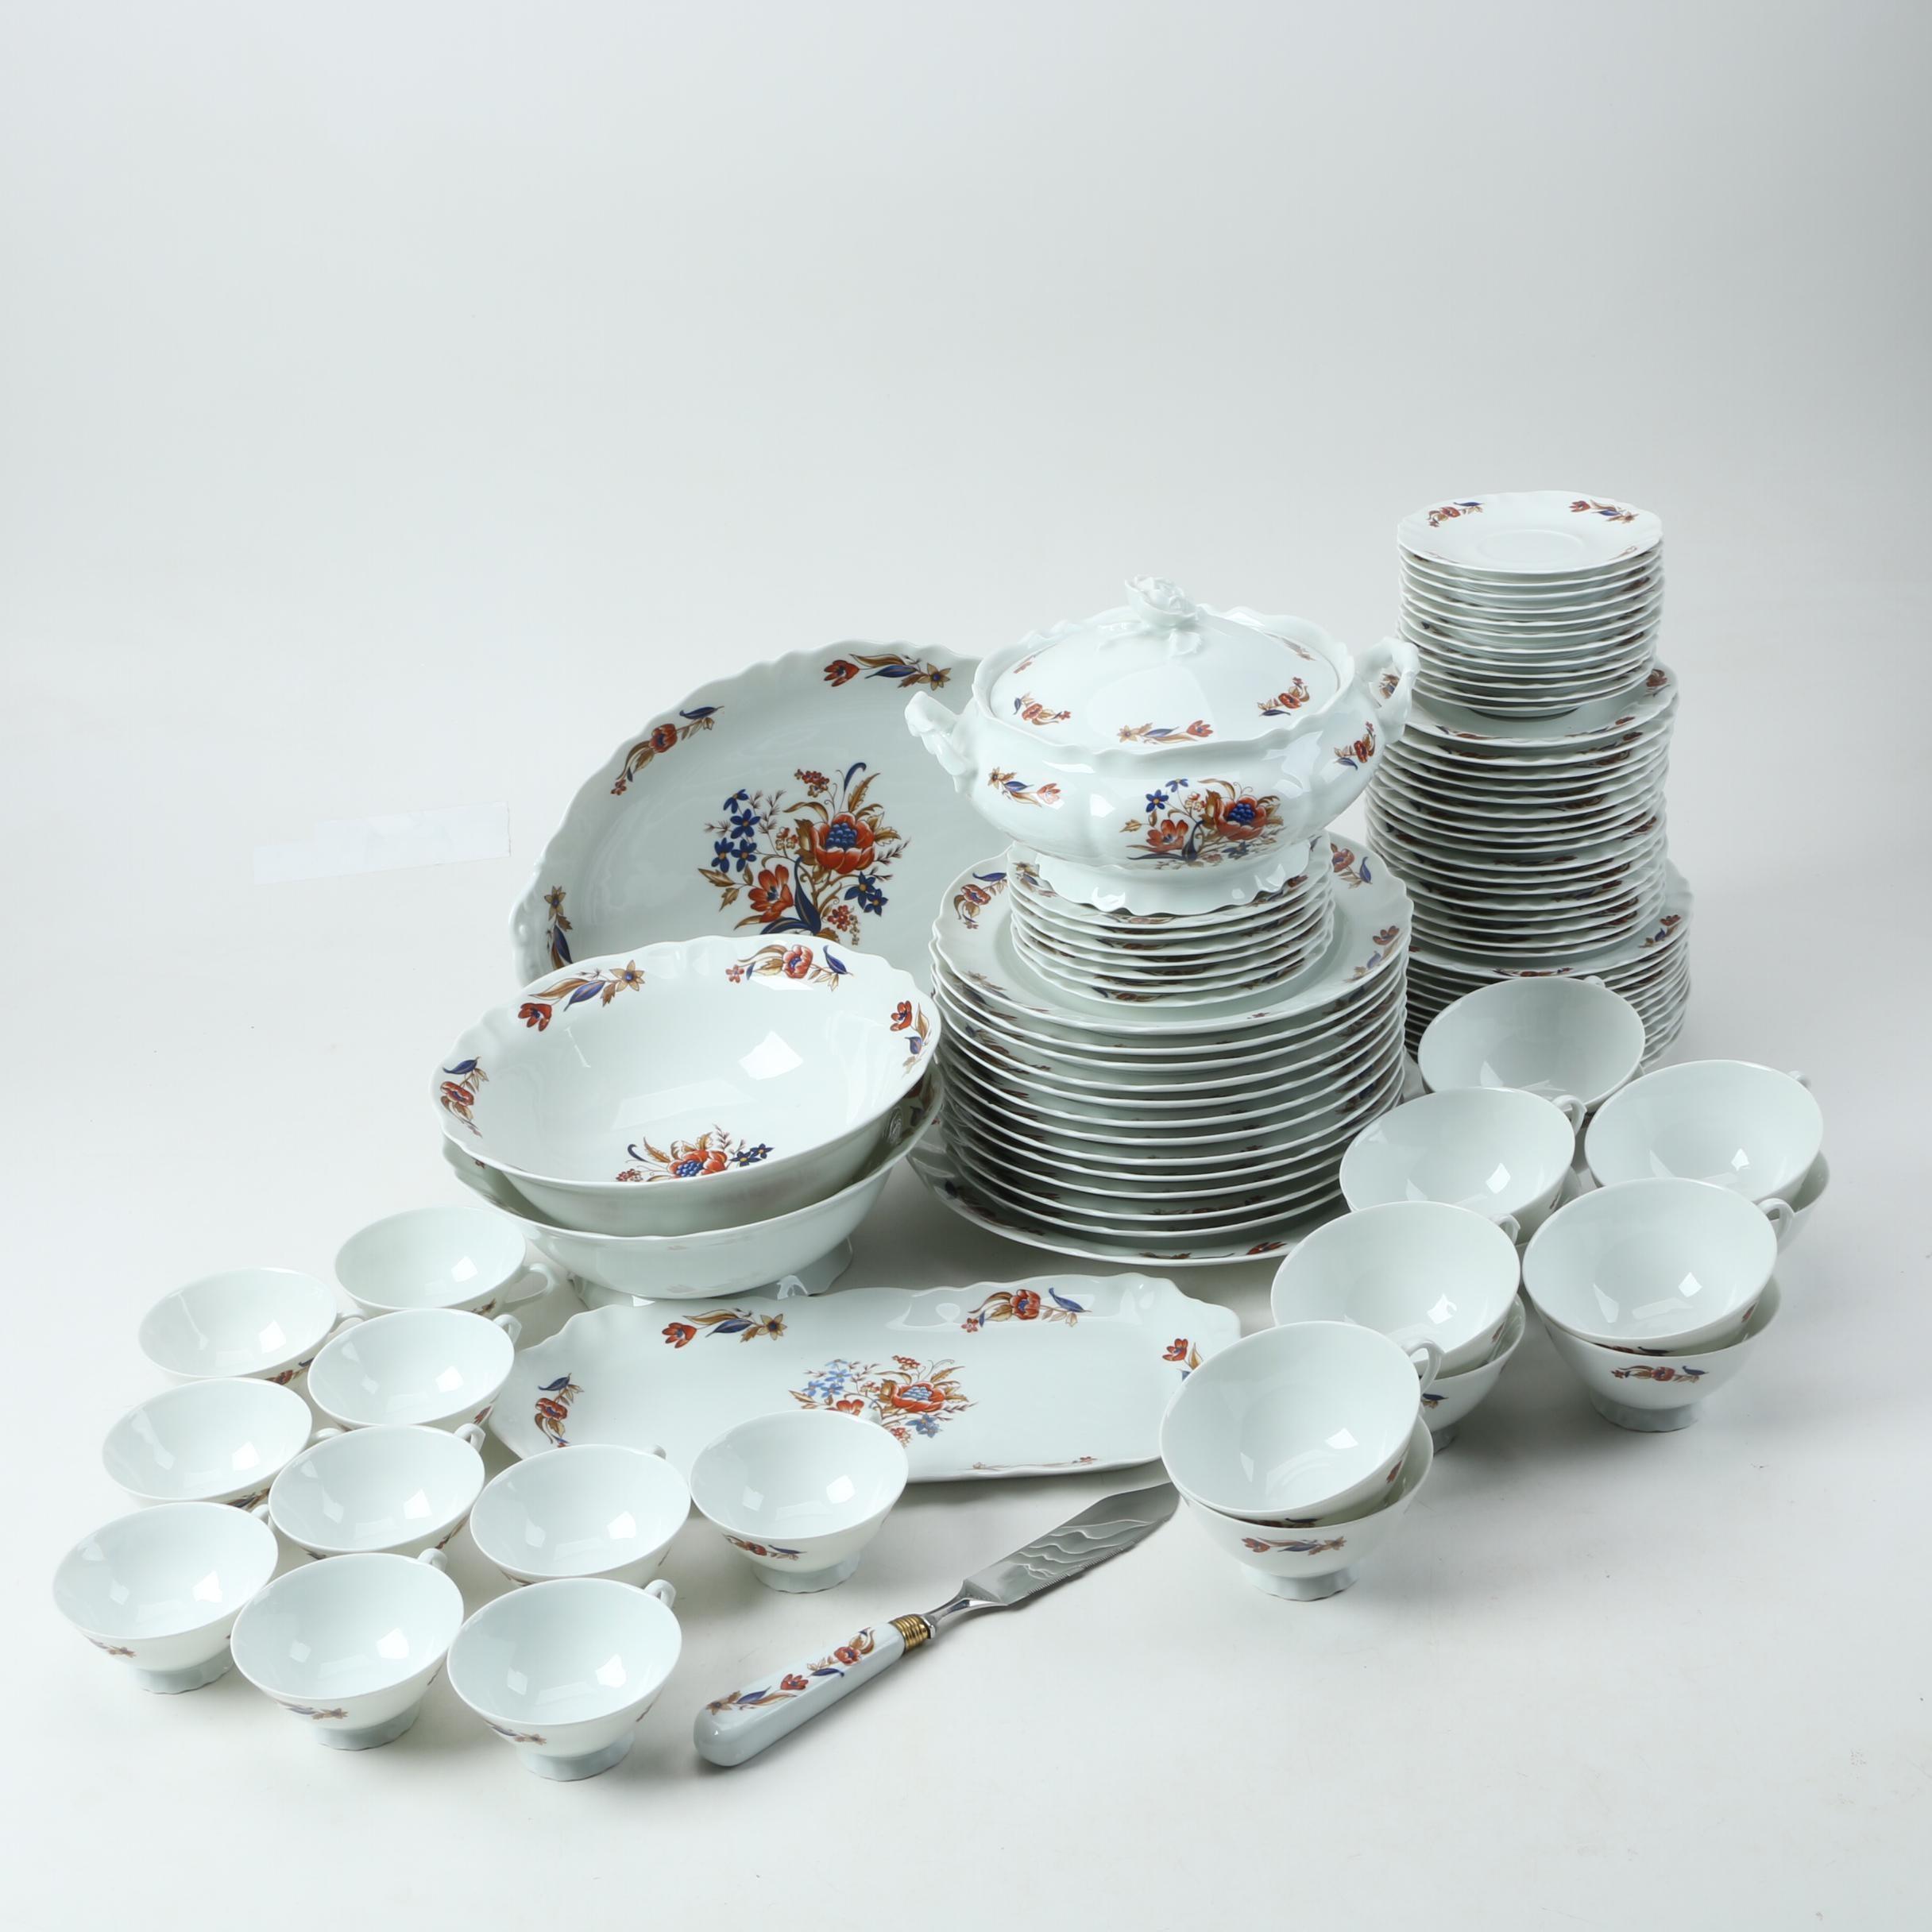 Chamart Limoges Porcelain Tea and Dinnerware ... & Chamart Limoges Porcelain Tea and Dinnerware : EBTH